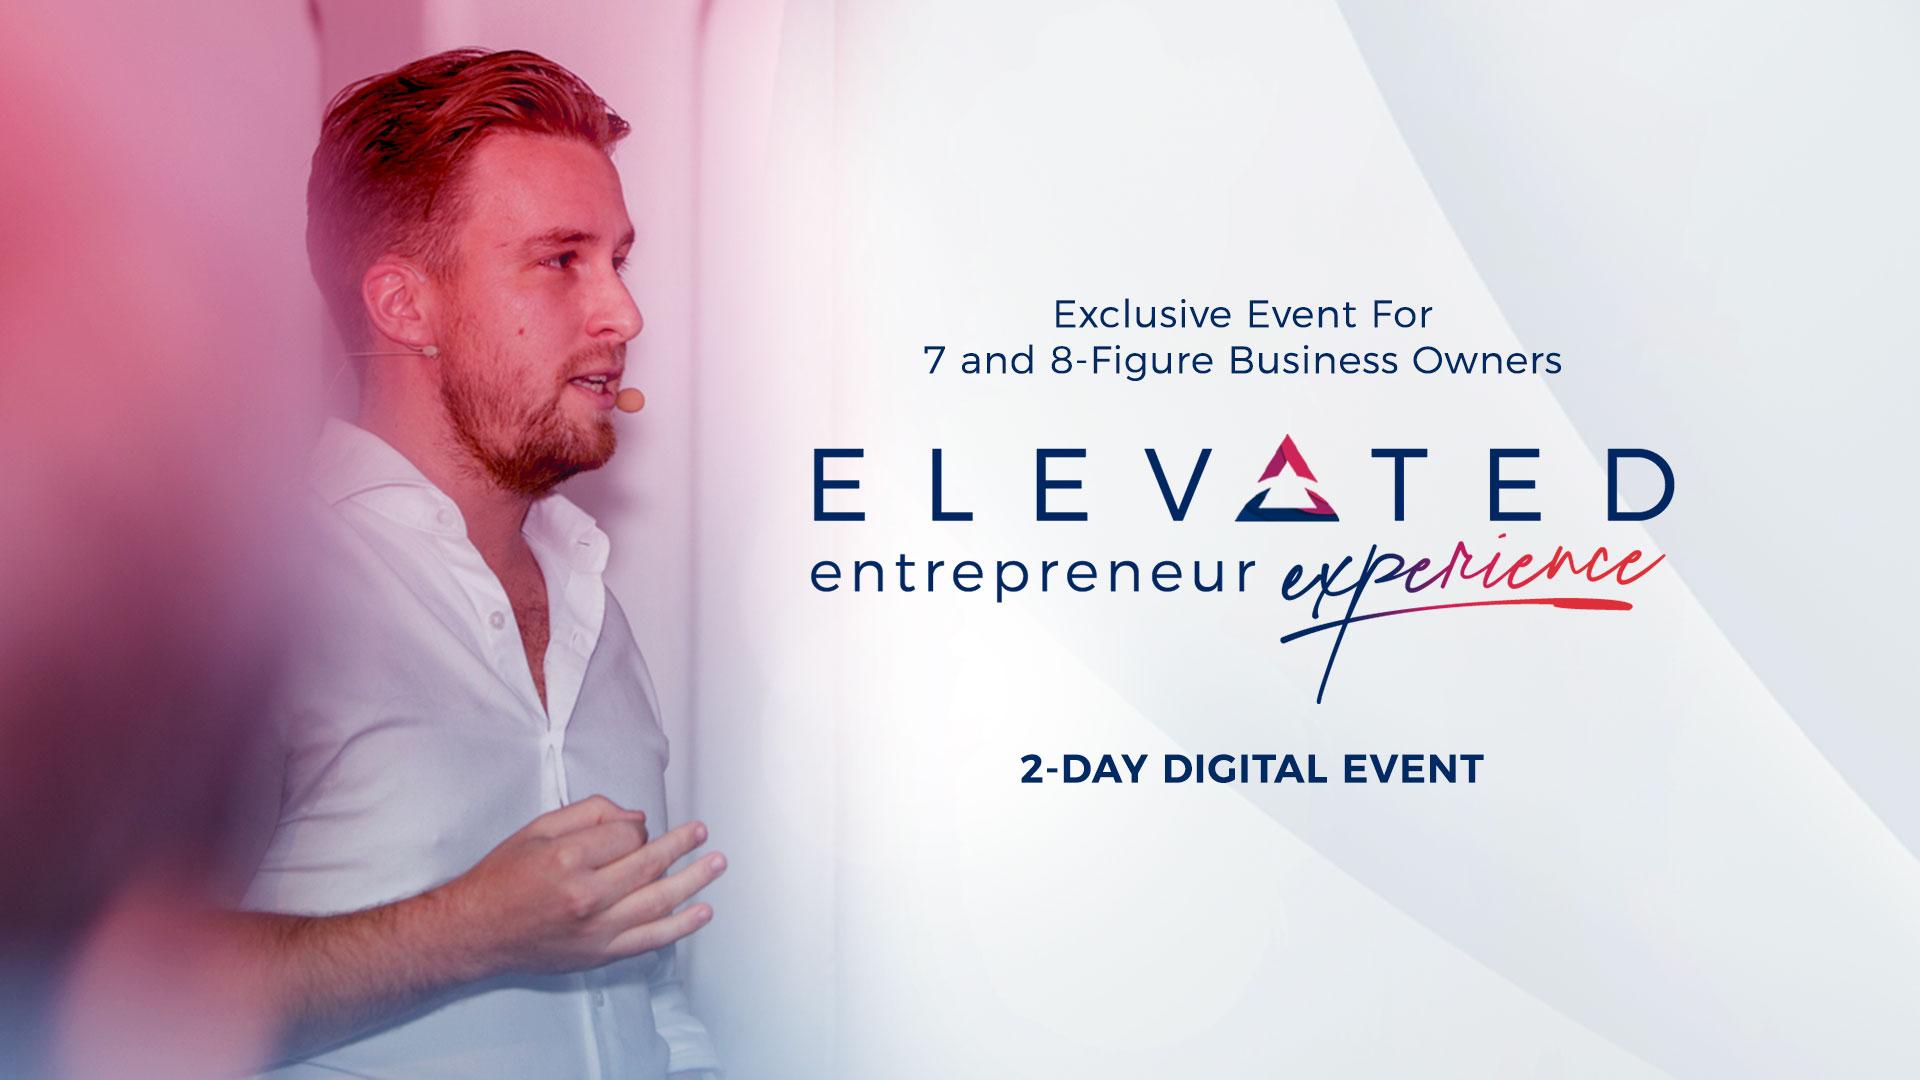 TheElevatedEntrepreneur_Thank-YouPage_Final